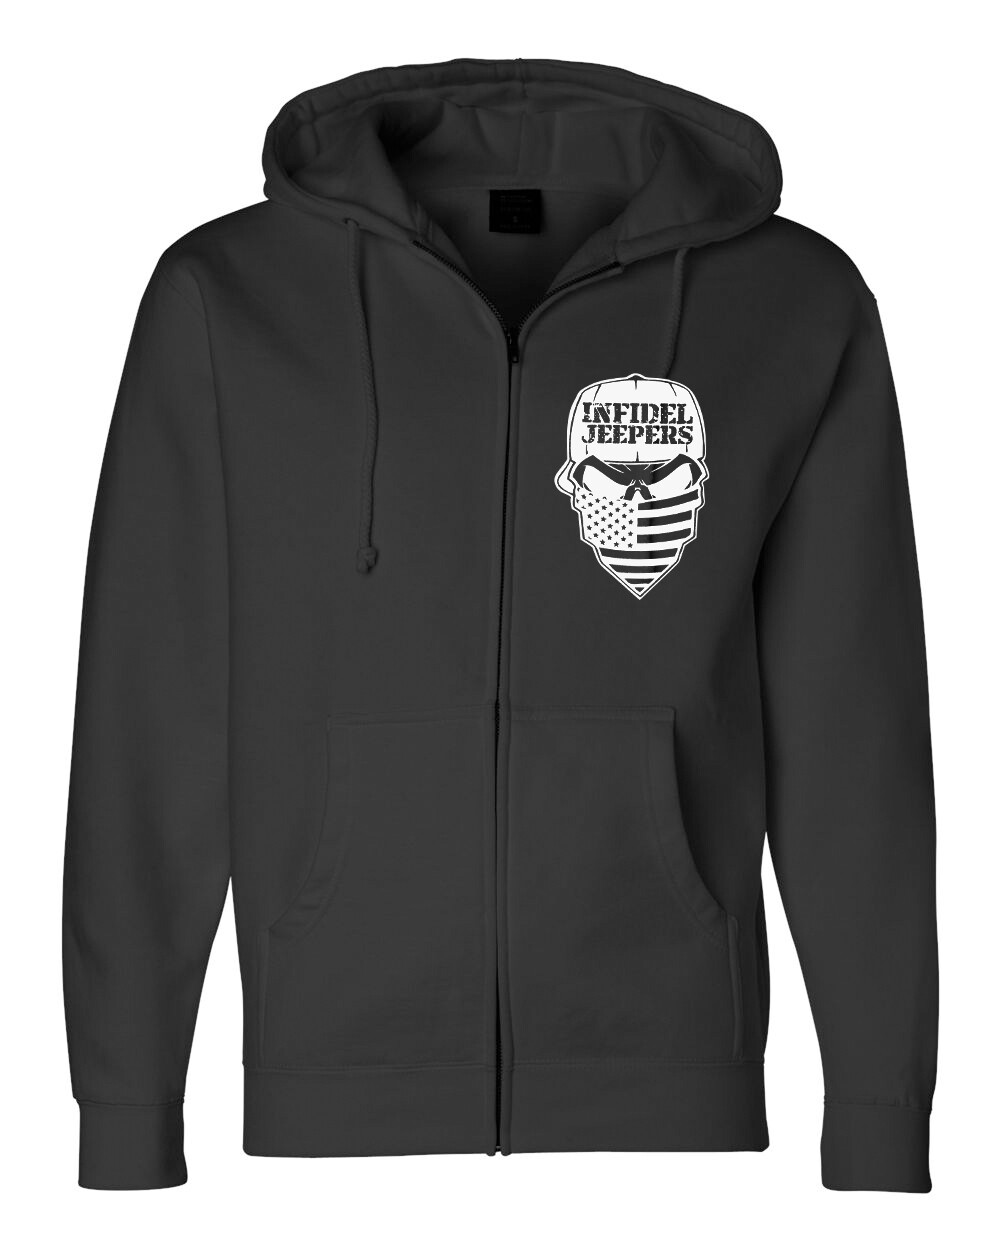 Premium Zippered Hoodie: Label Back